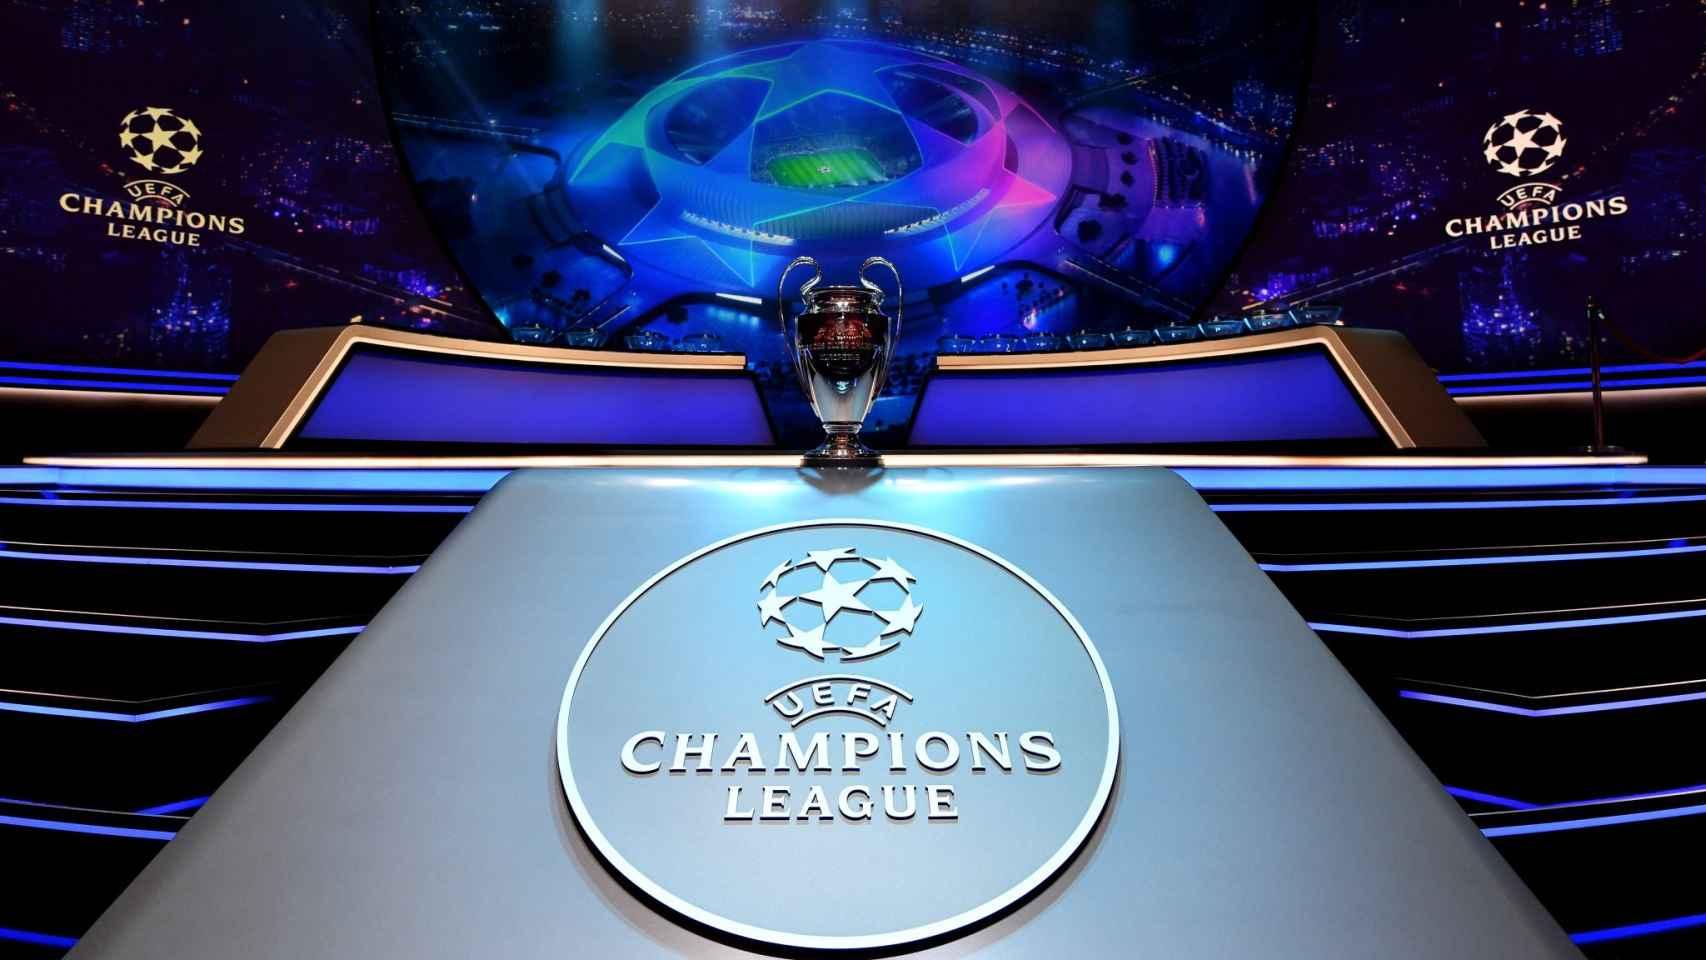 Sorteo de la Champions League. Foto: Twitter (@PSG_Inside)